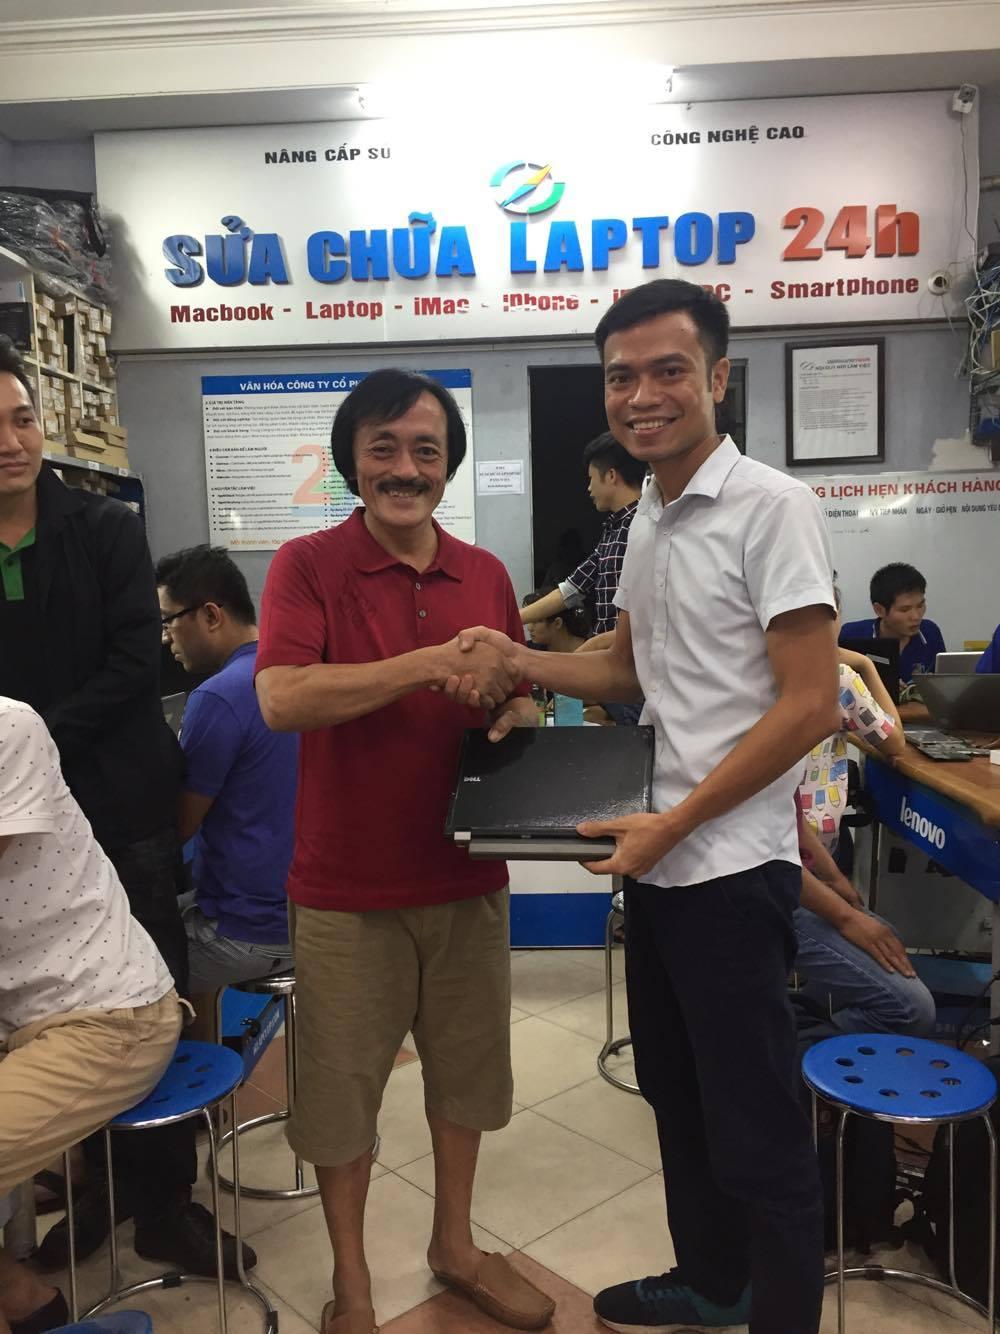 Nghe si Giang Coi - Cau chuyen 'that' tu man anh toi doi thuong tai Sua chua laptop 24h.com hinh anh 2